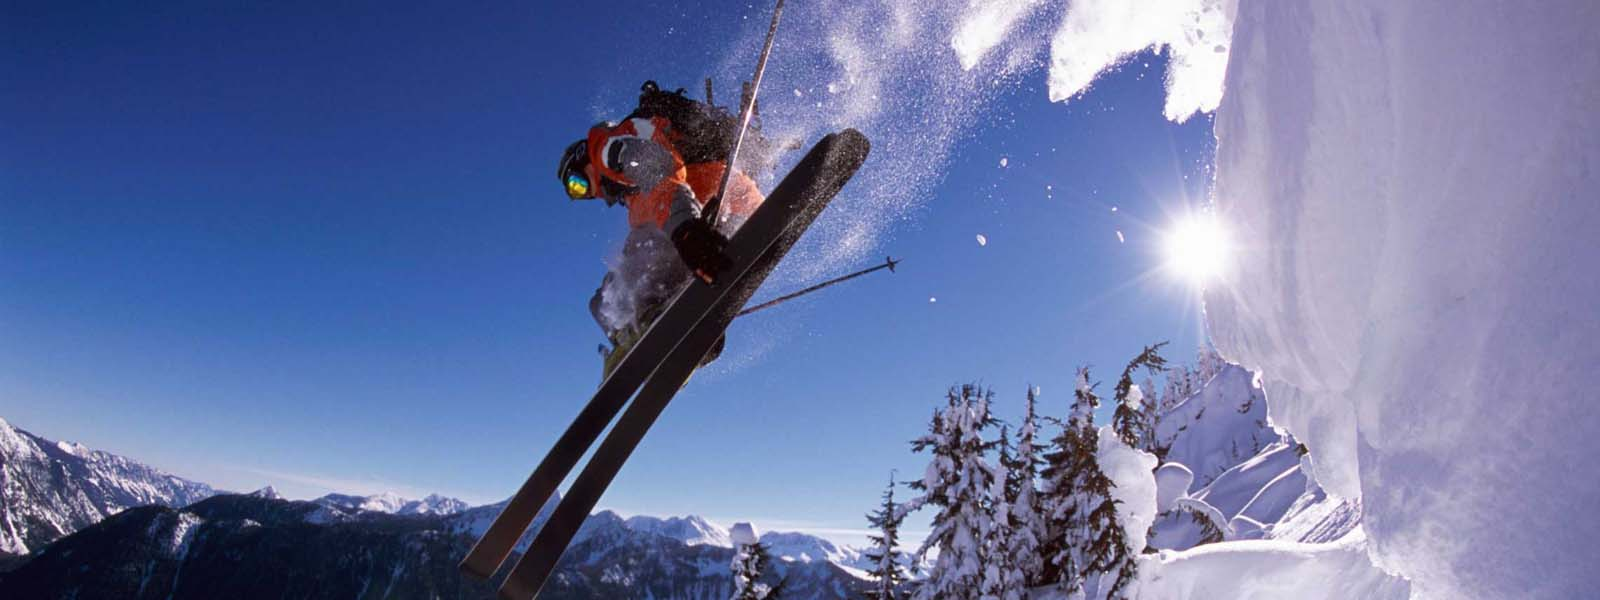 DownhillSkiingCrop.jpg